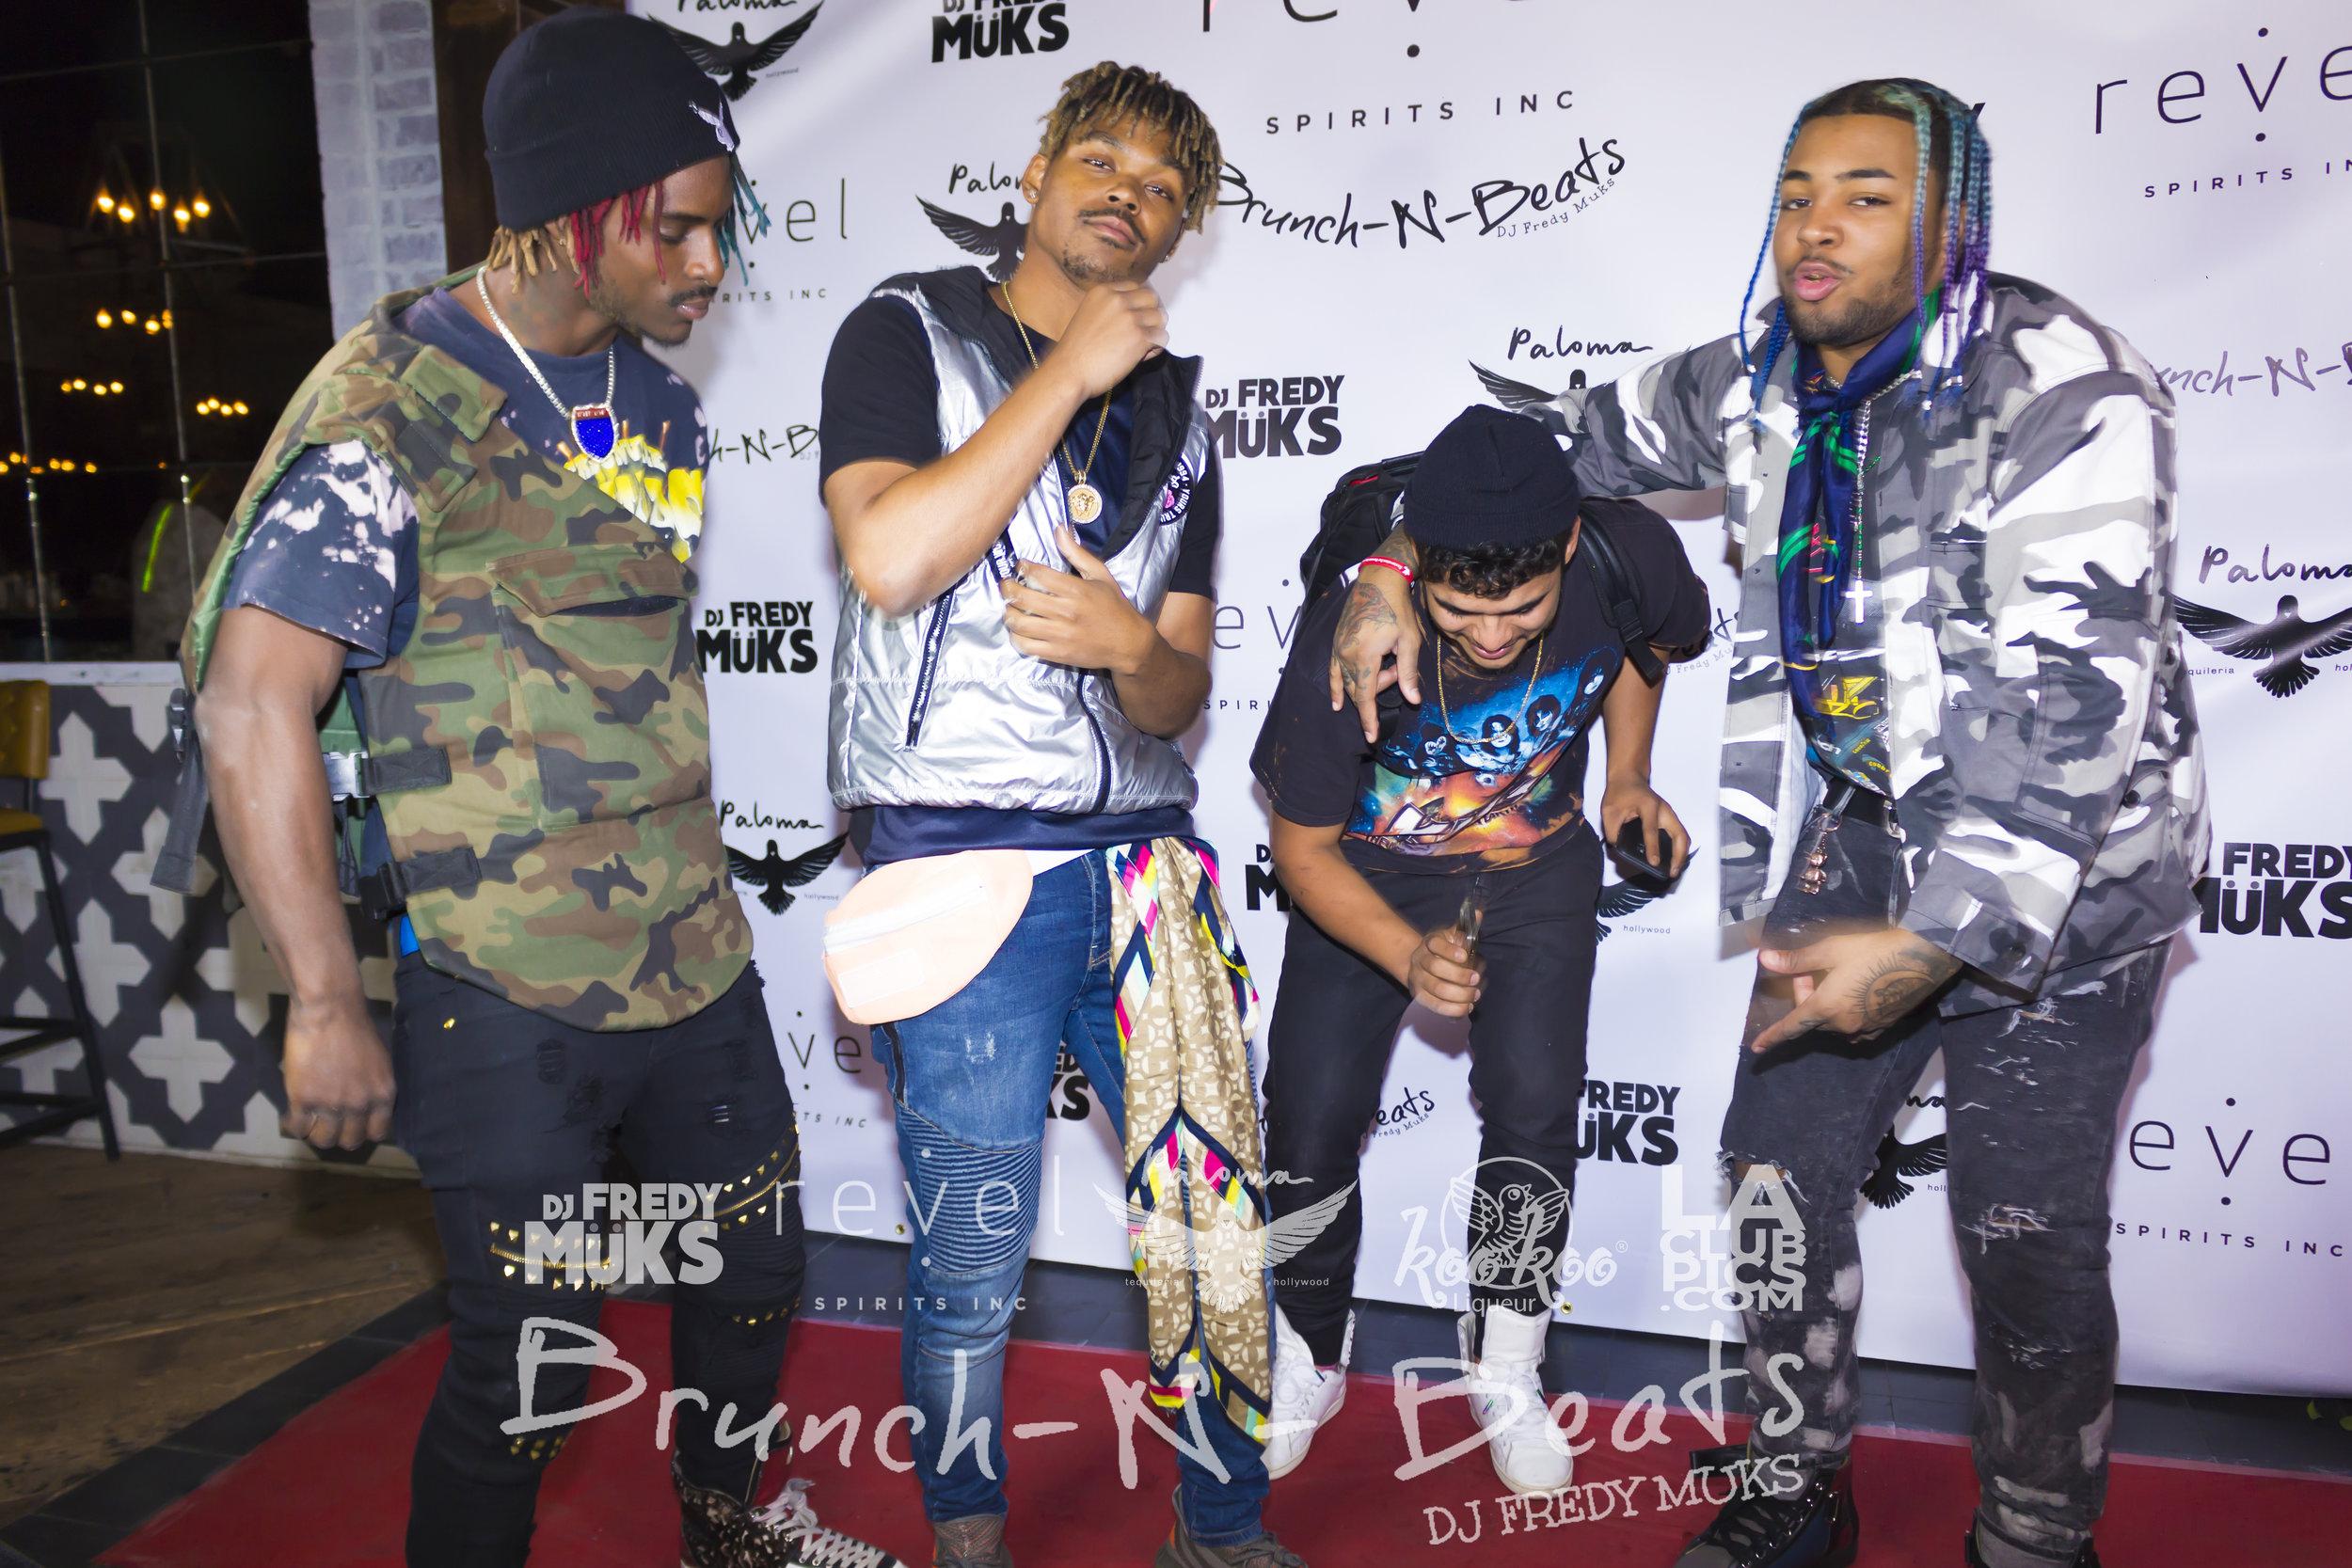 Brunch-N-Beats - Paloma Hollywood - 02-25-18_217.jpg